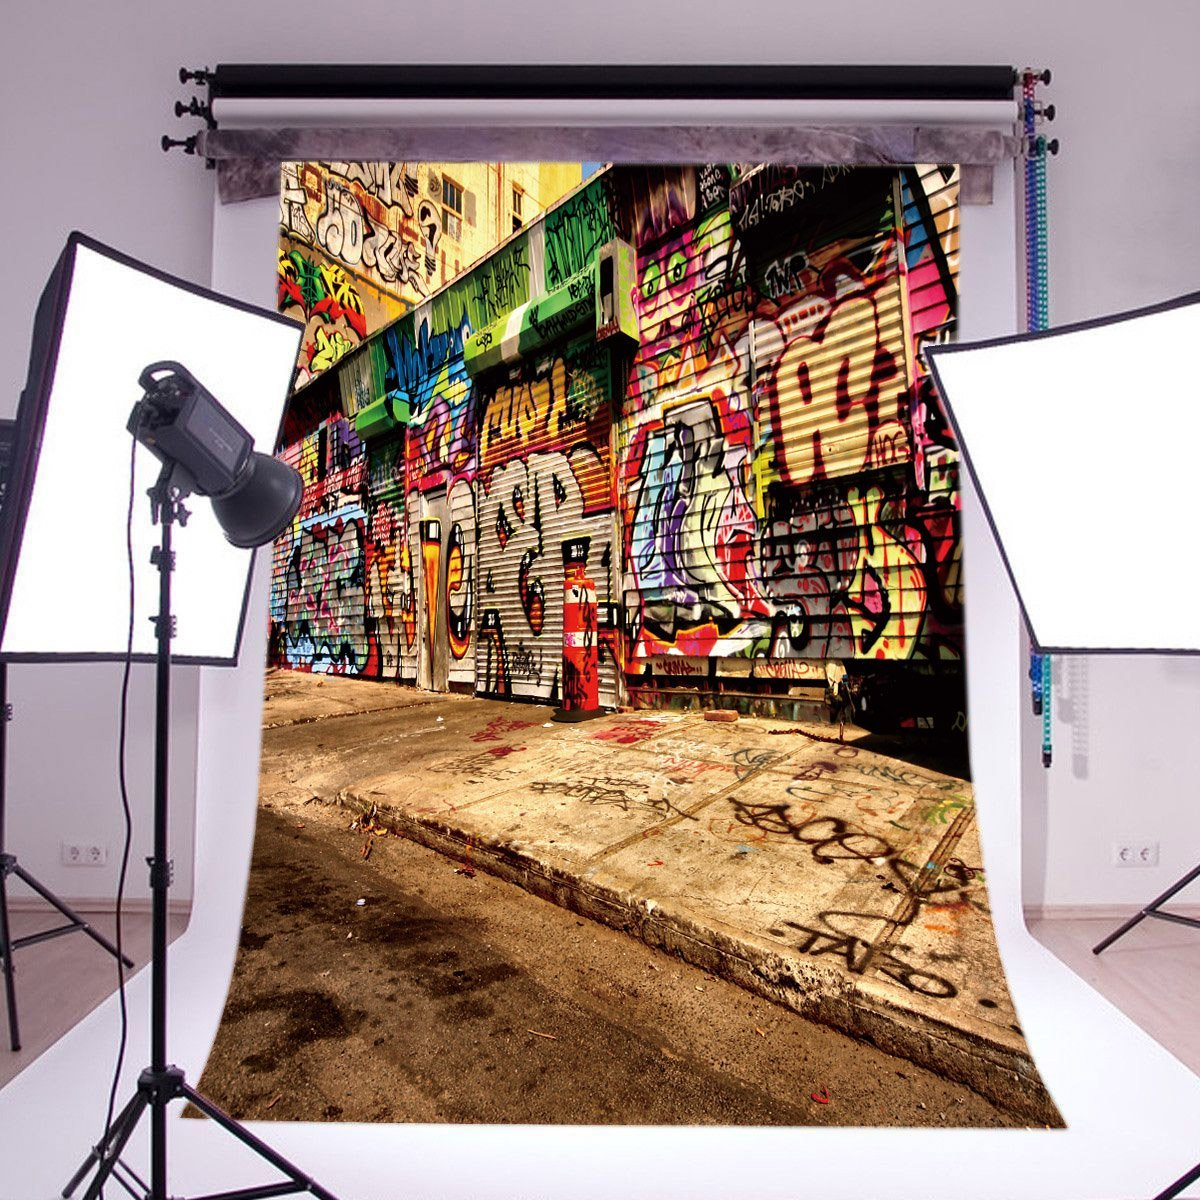 LB 5x7ft Street Graffiti Vinyl Photography Backdrop Customized Photo Background Studio Prop Wall Decor GY91